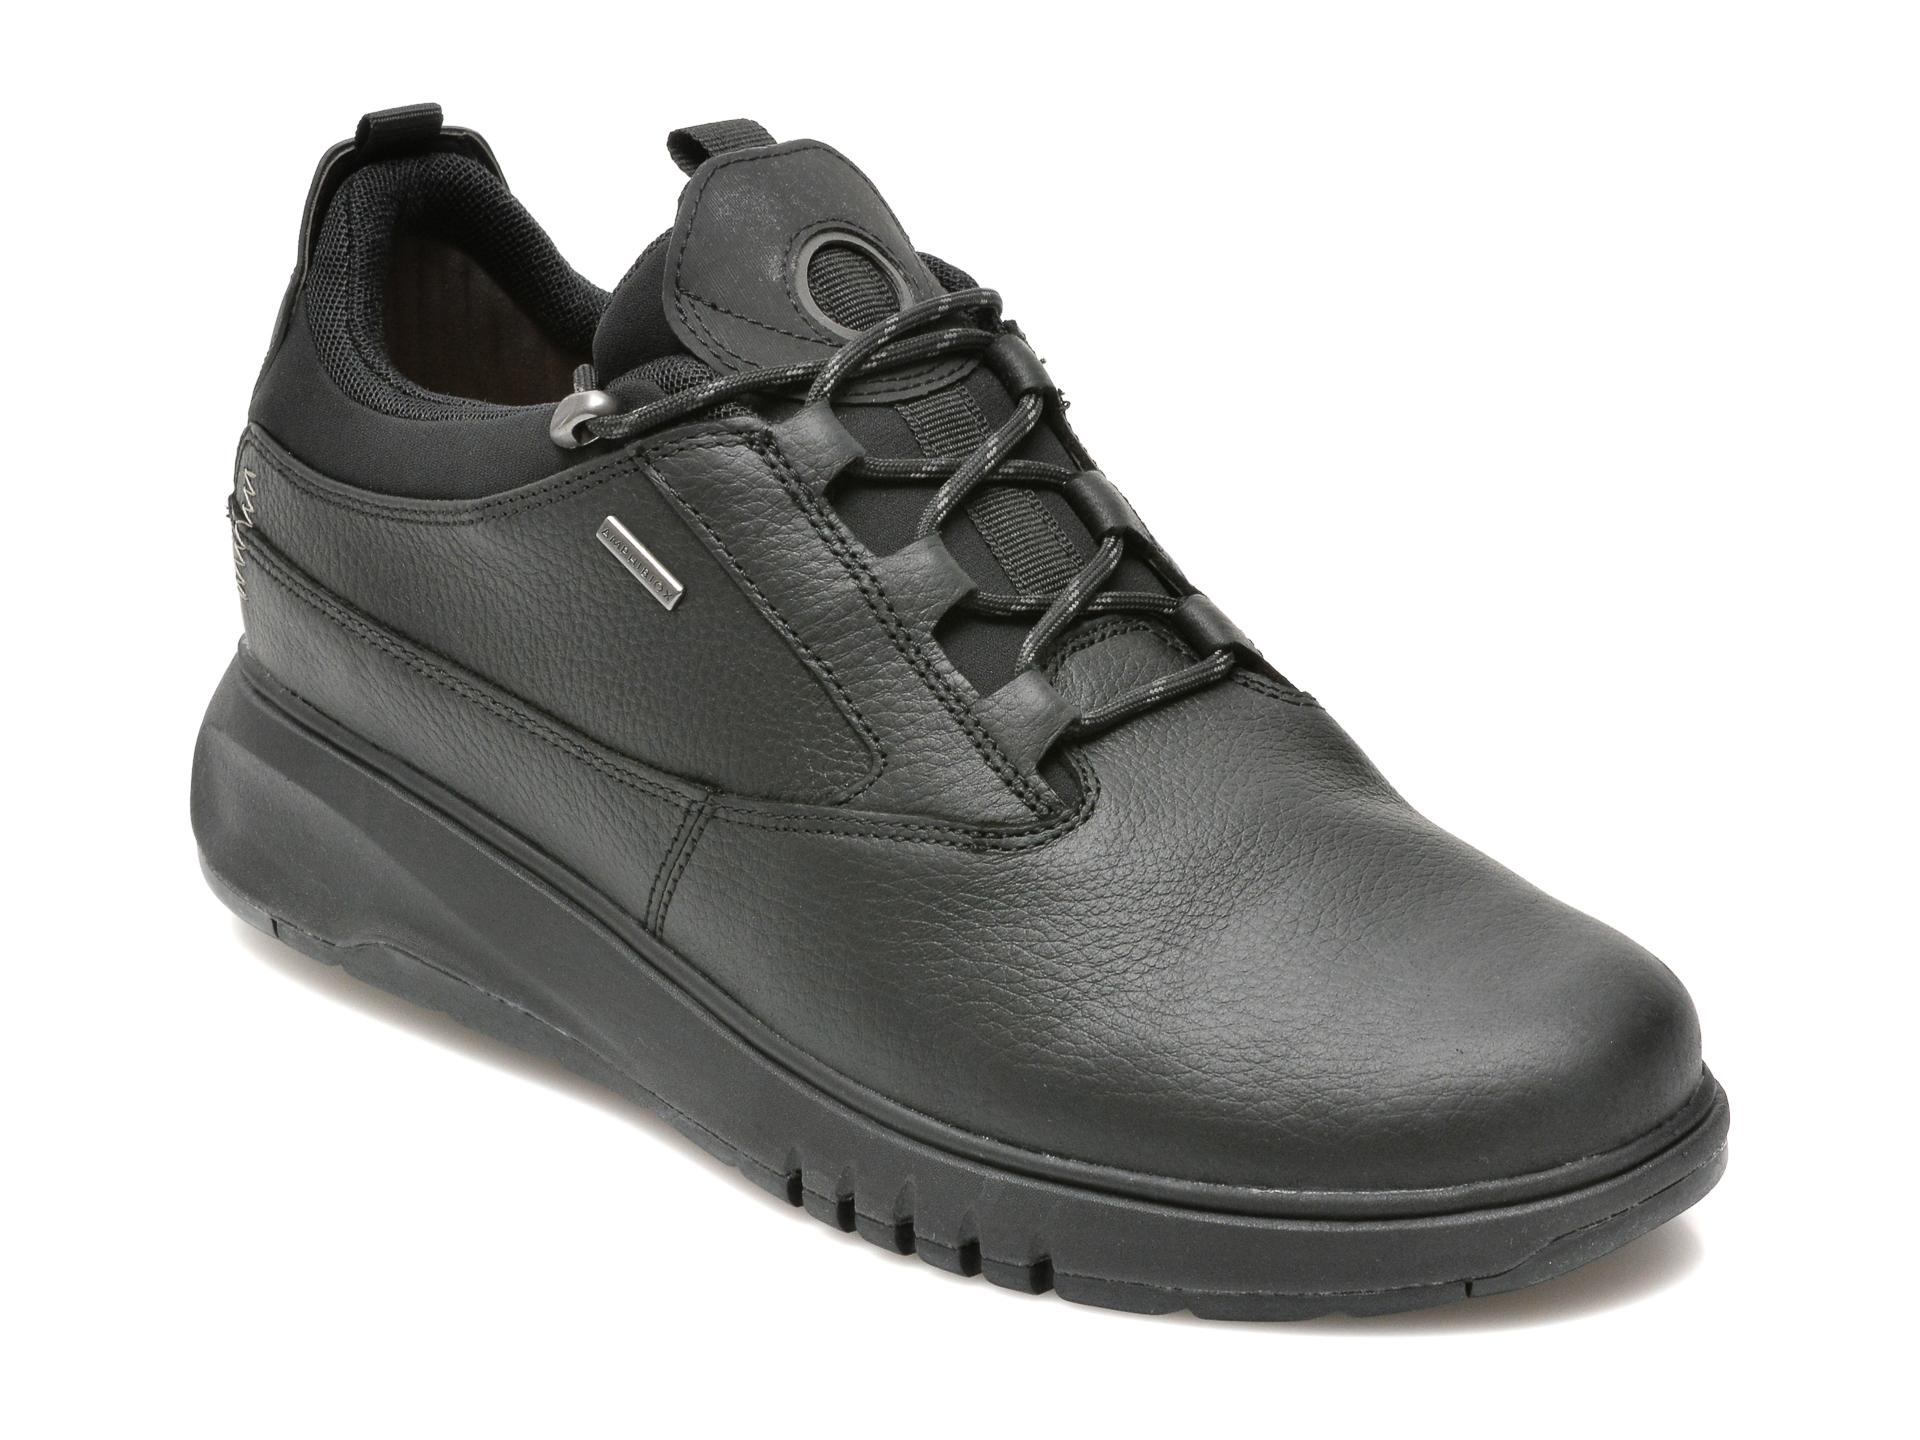 Pantofi Geox Negri, U16apa, Din Material Textil Si Piele Naturala